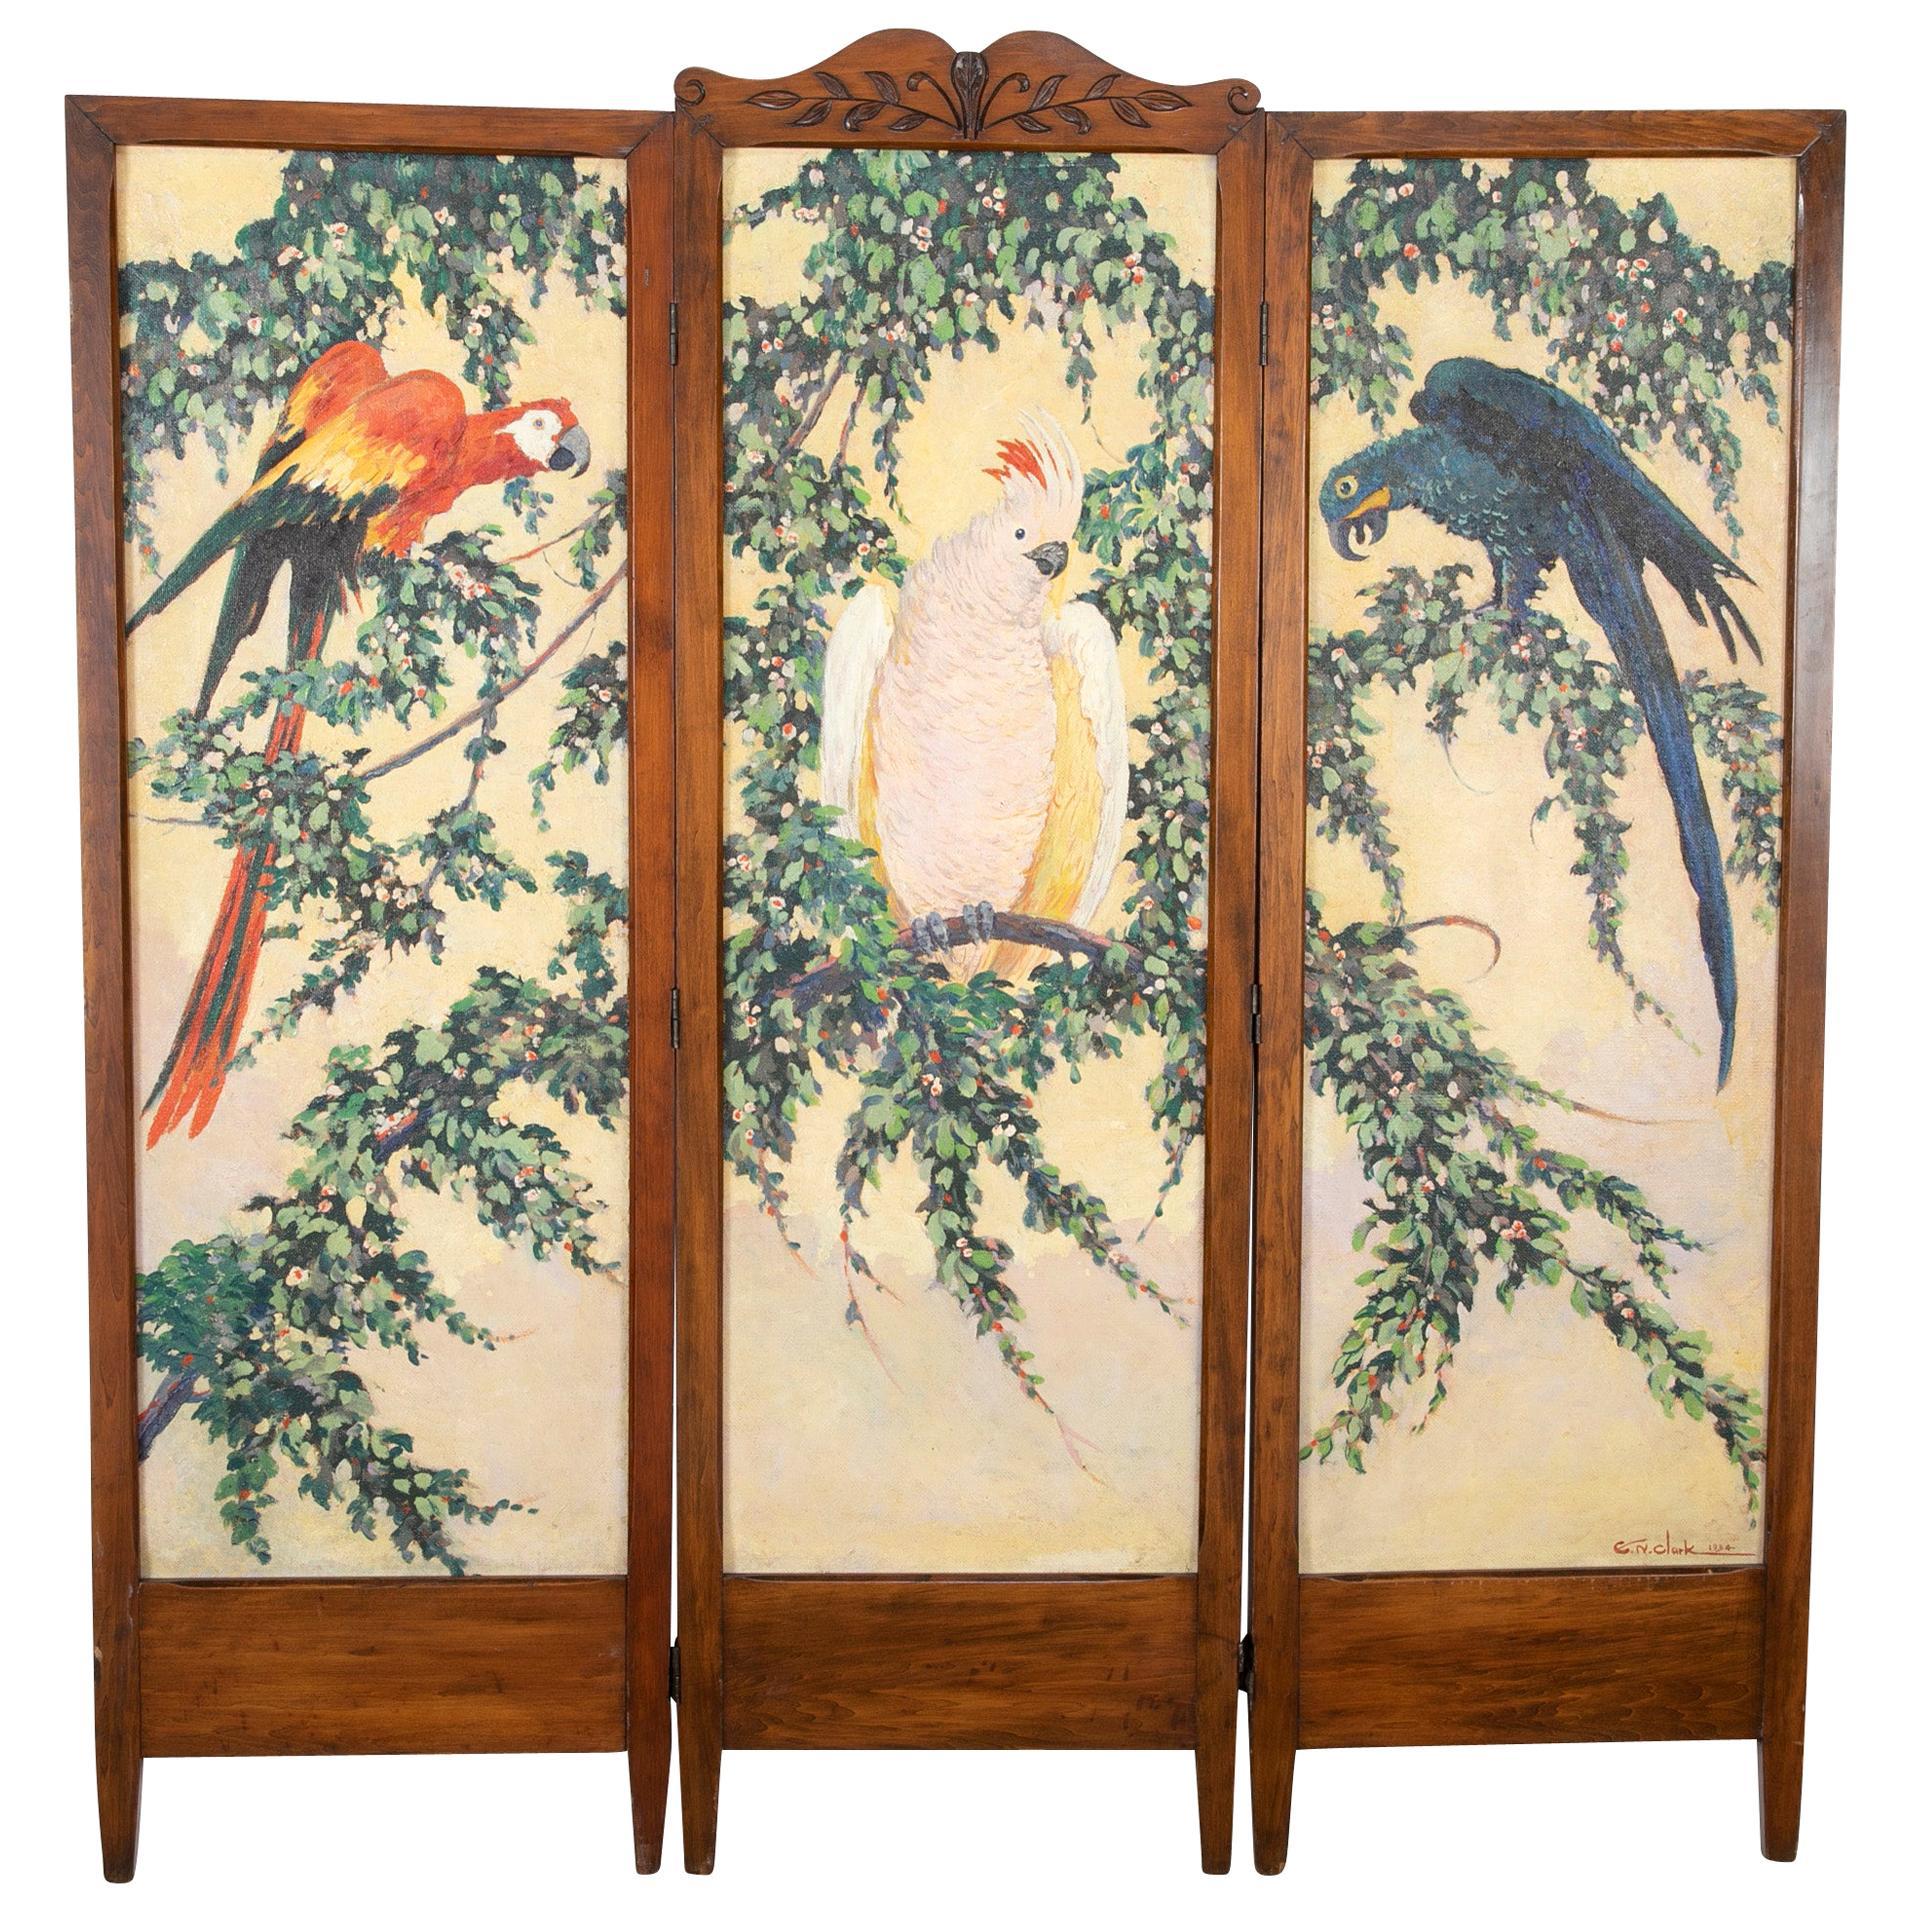 Three-Panel Folding Screen by Egbert Norman Clark